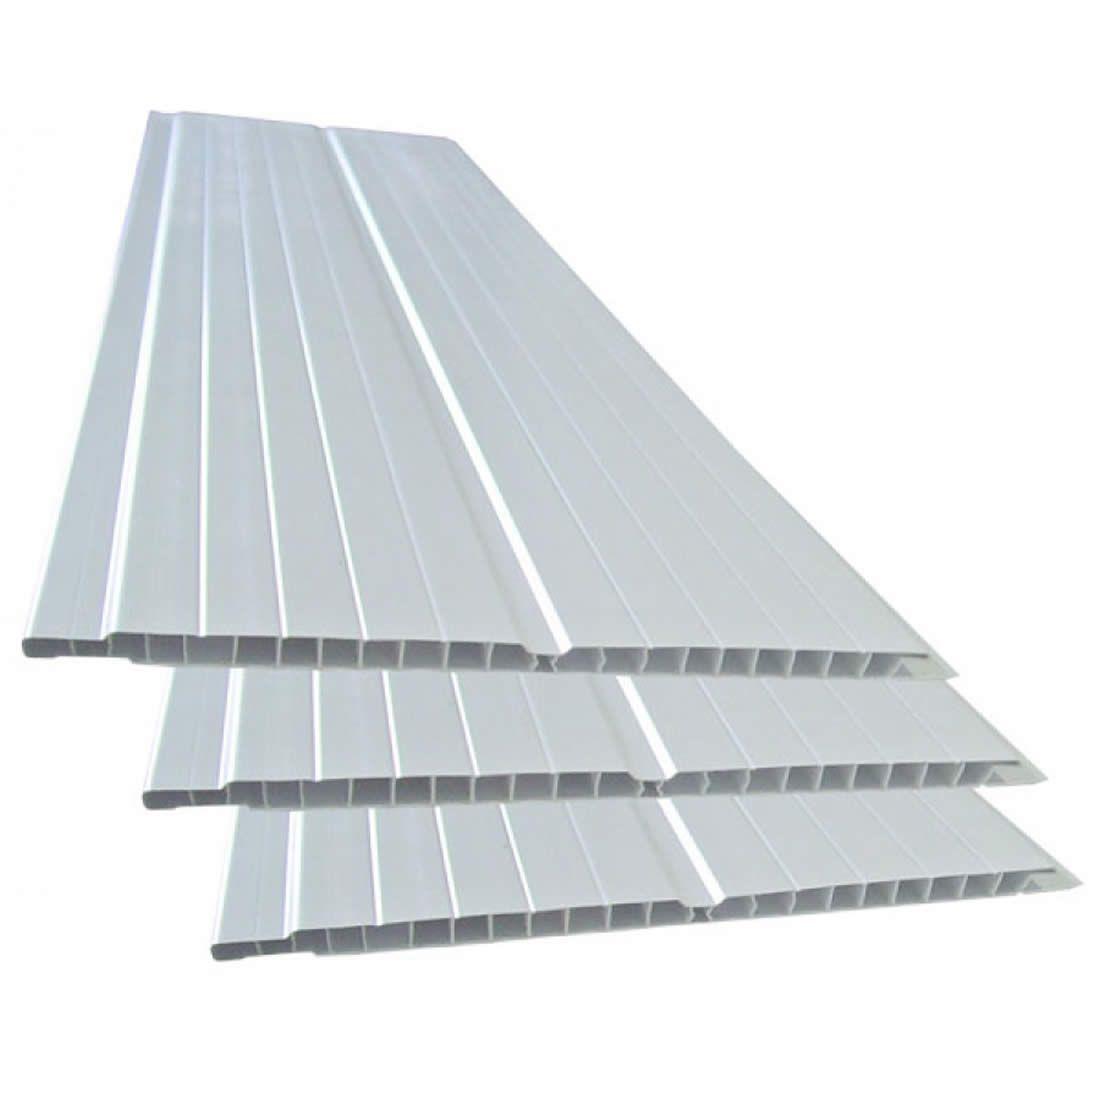 Forro PVC 200X8mm de 8,00 Metros Frisado Branco Mais PVC, 1,60mts = 1 Peças